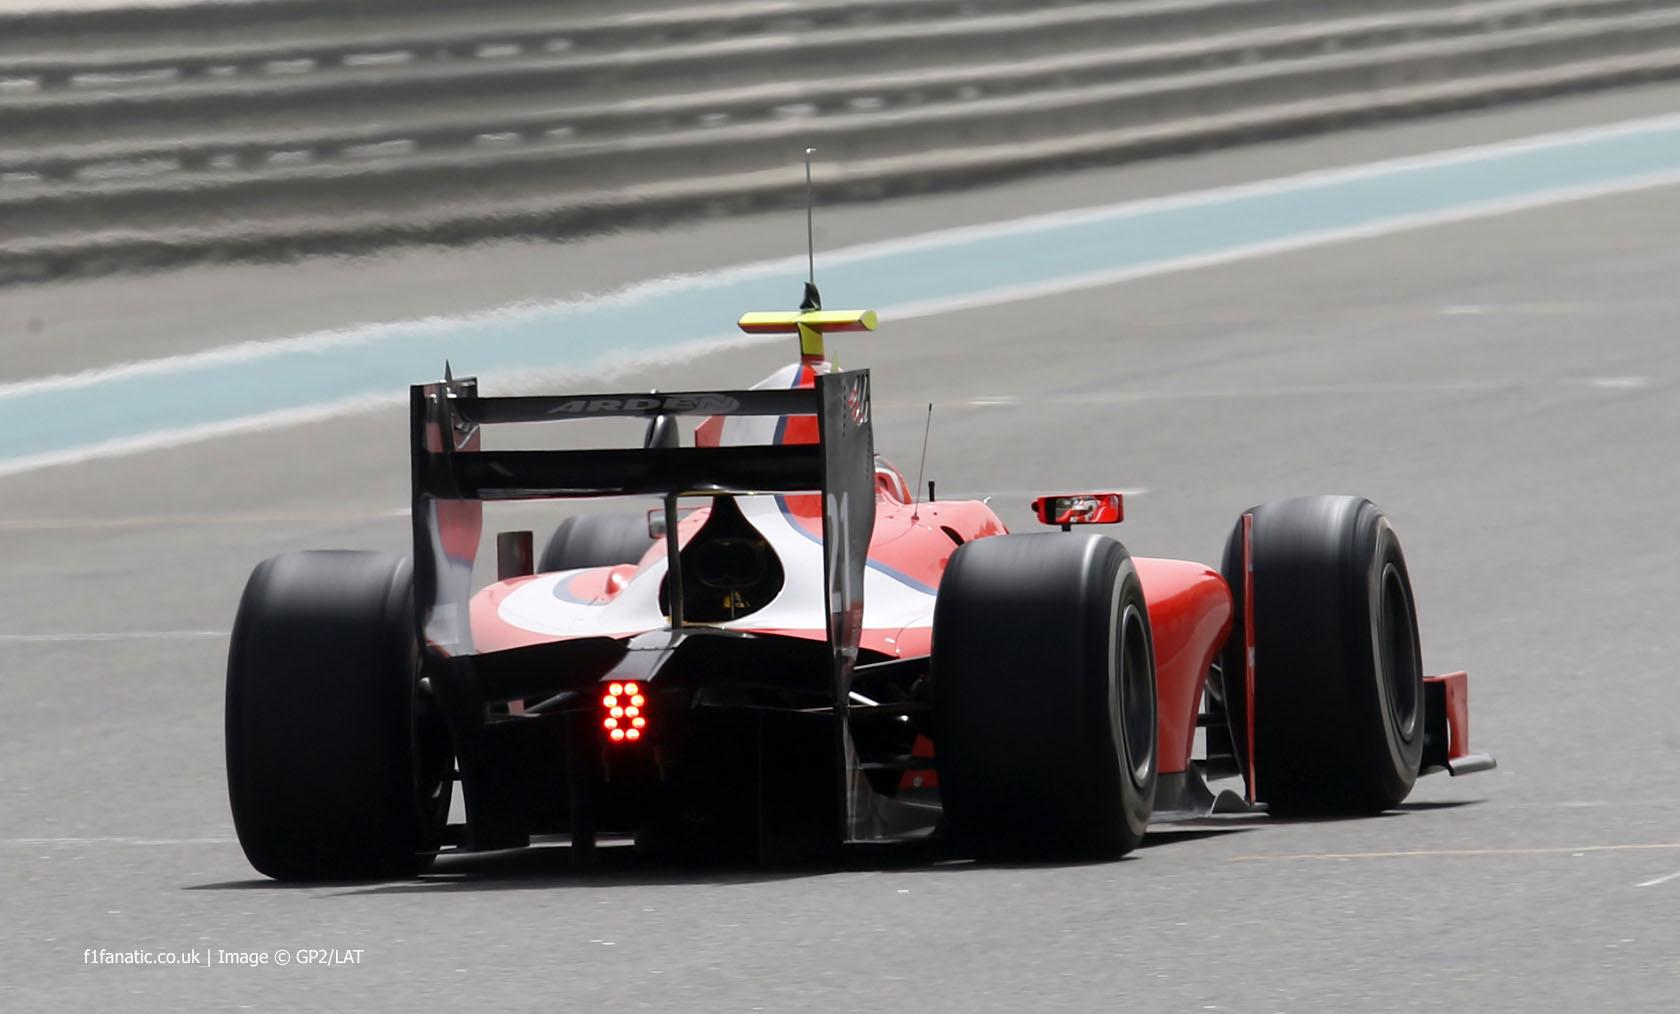 Norman Nato, Arden, GP2 testing, Yas Marina, 2015